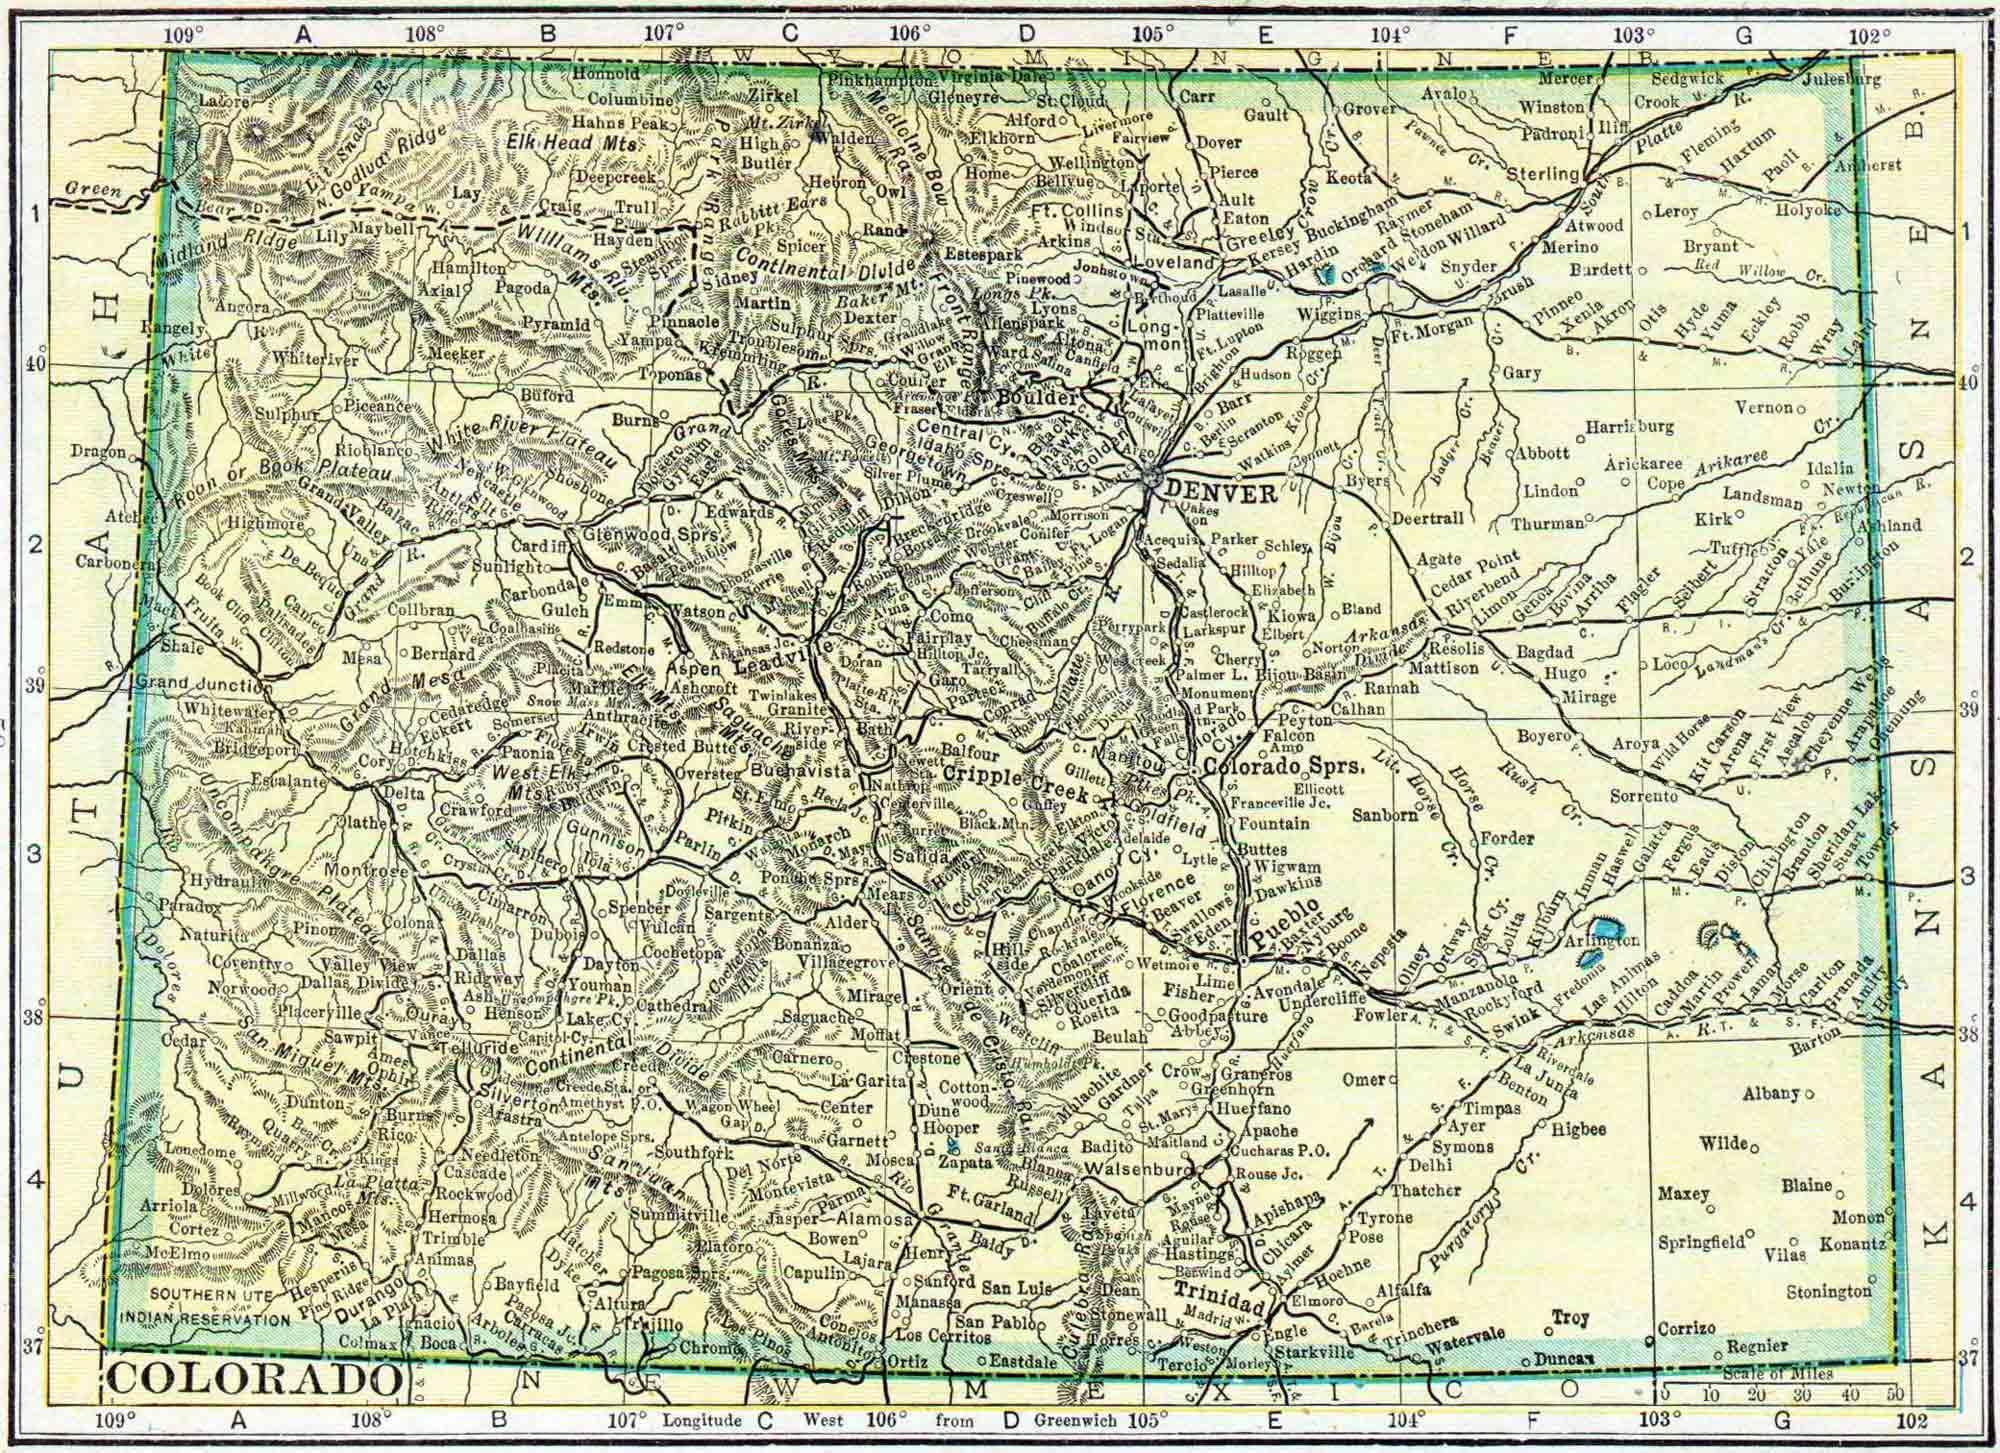 Colorado Census Map Access Genealogy - Census us 1910 map